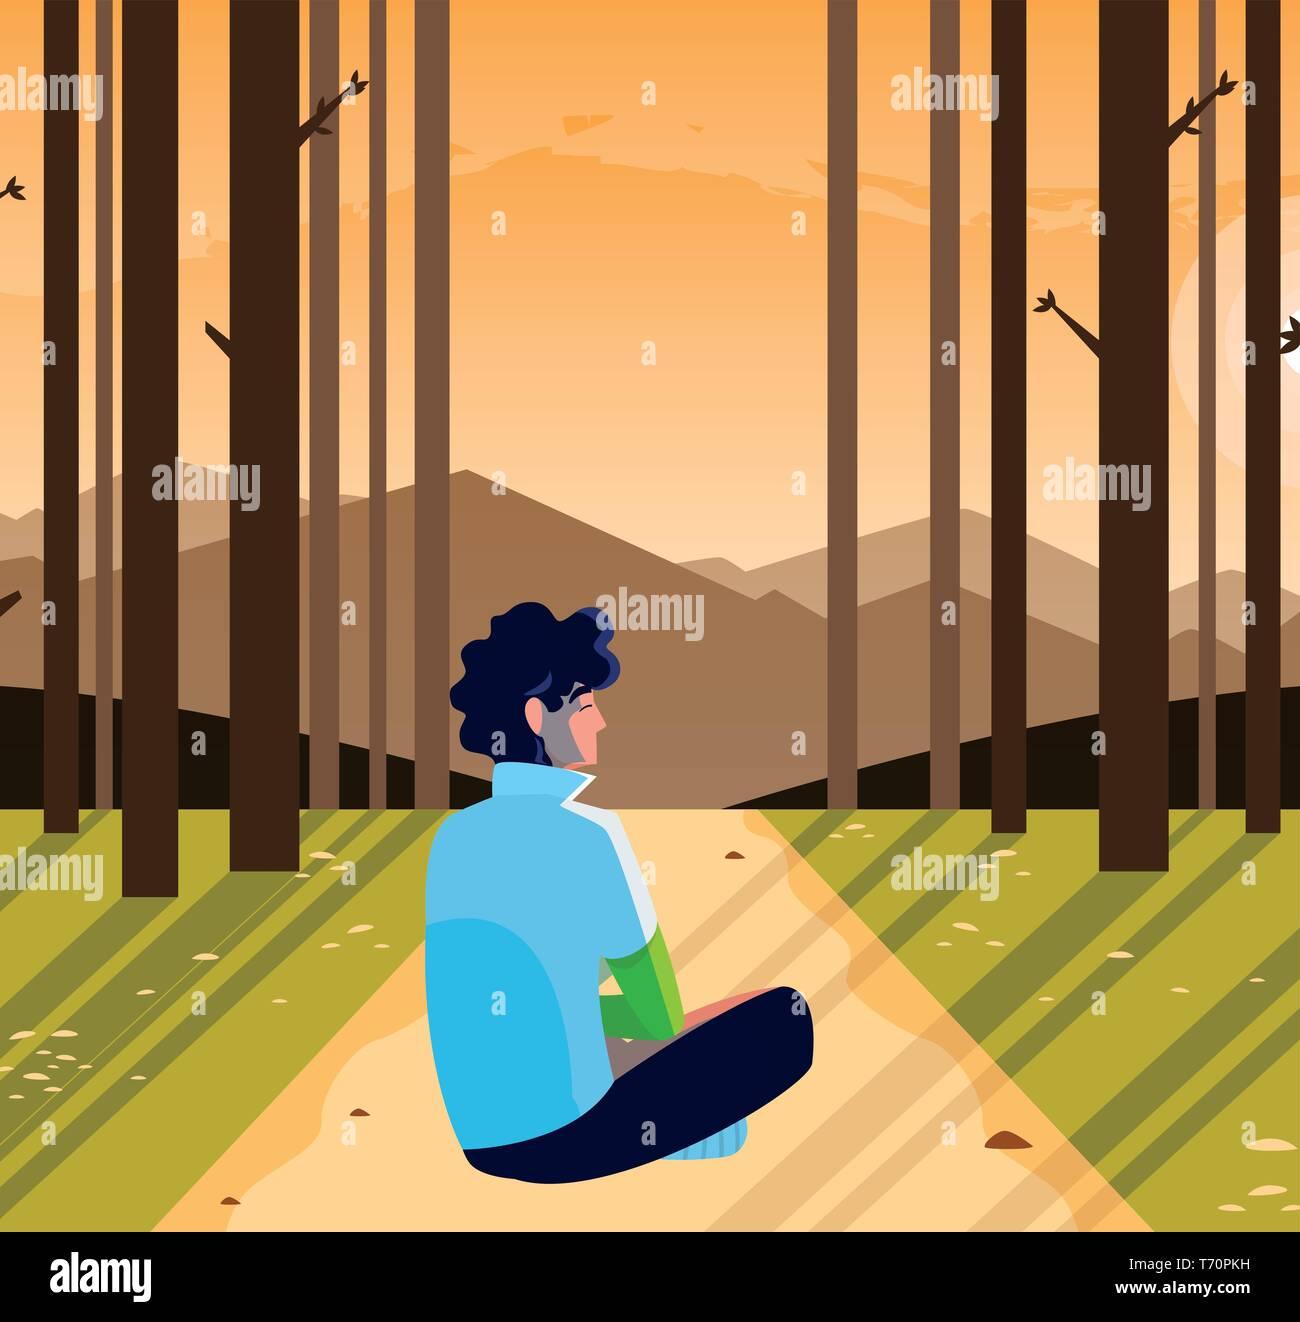 man contemplating horizon in the forest scene vector illustration design - Stock Vector